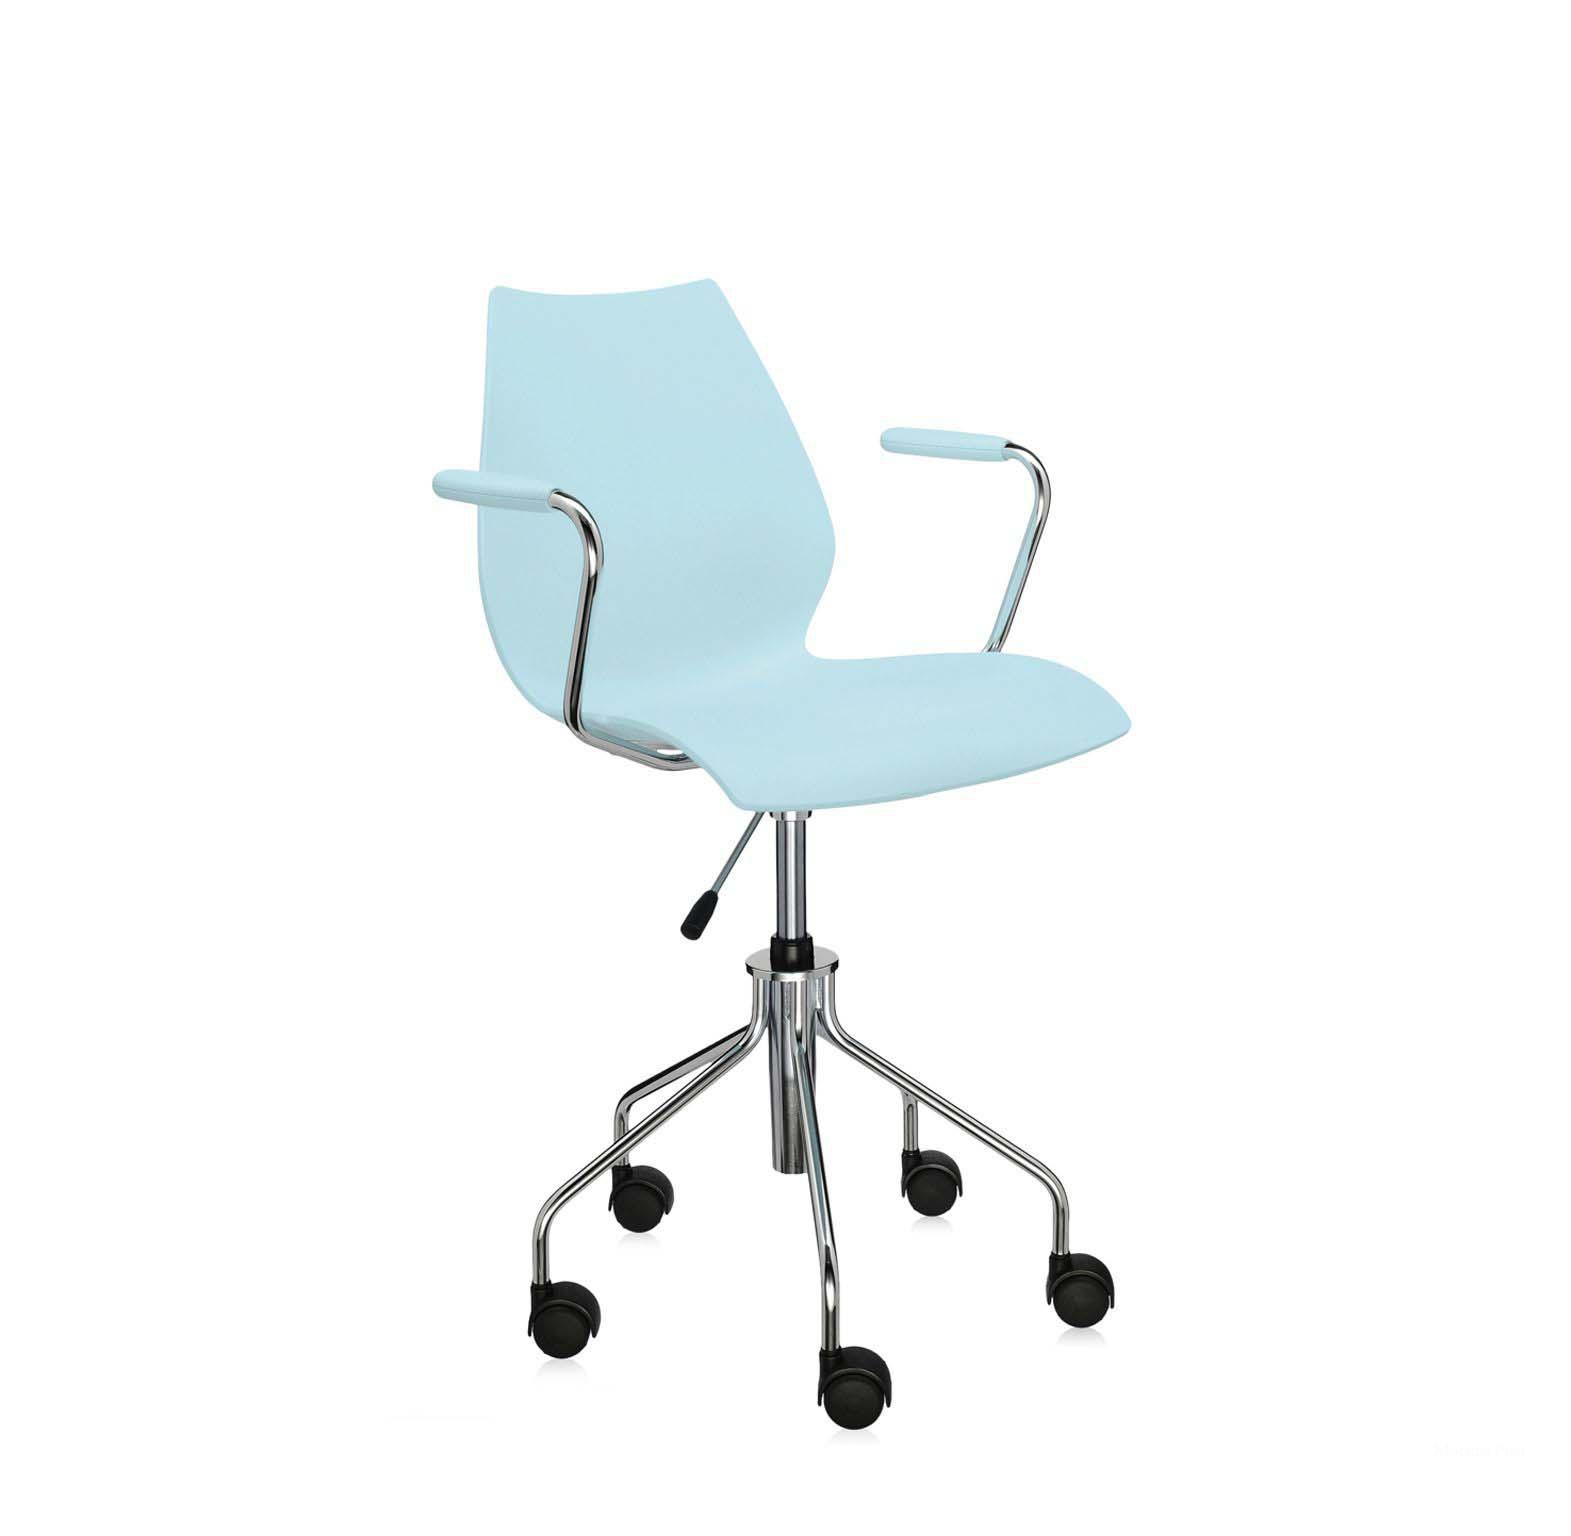 Кресло на колесиках Maui Armchair Kartell Мебель МР